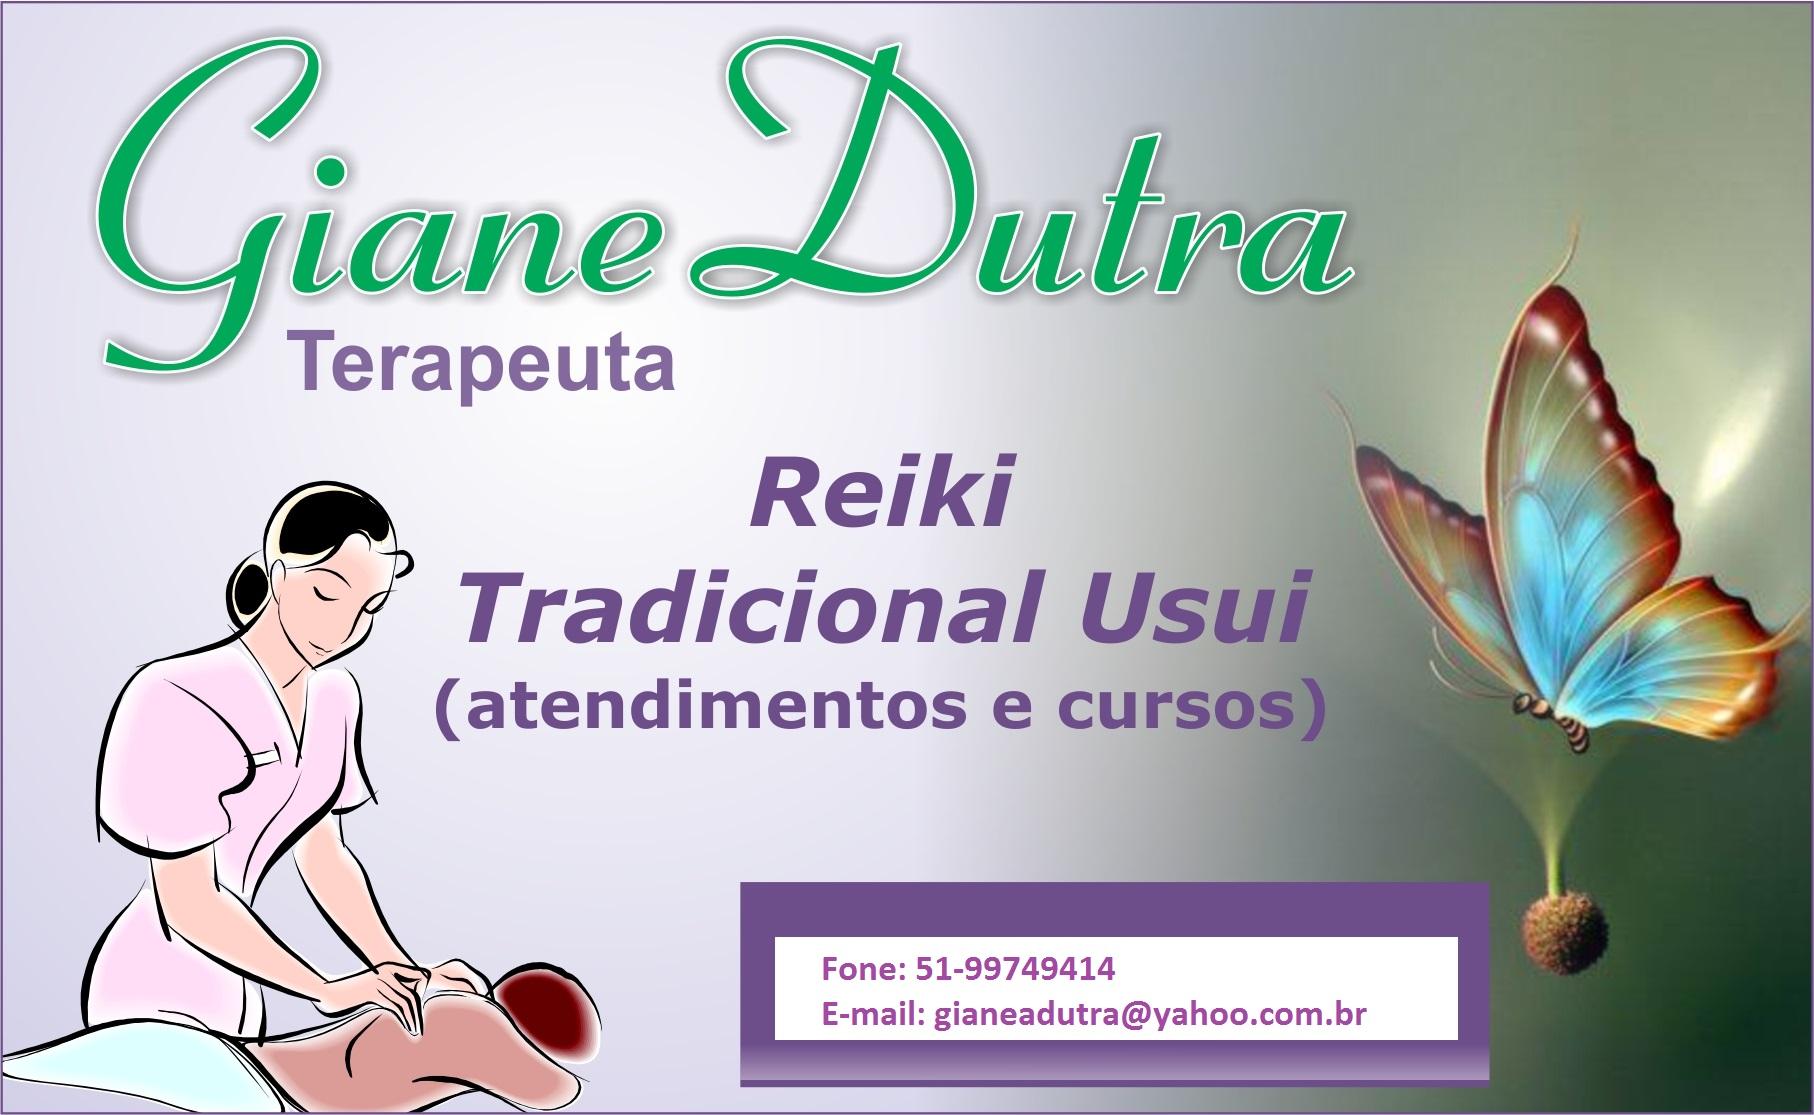 Giane dutra (1)